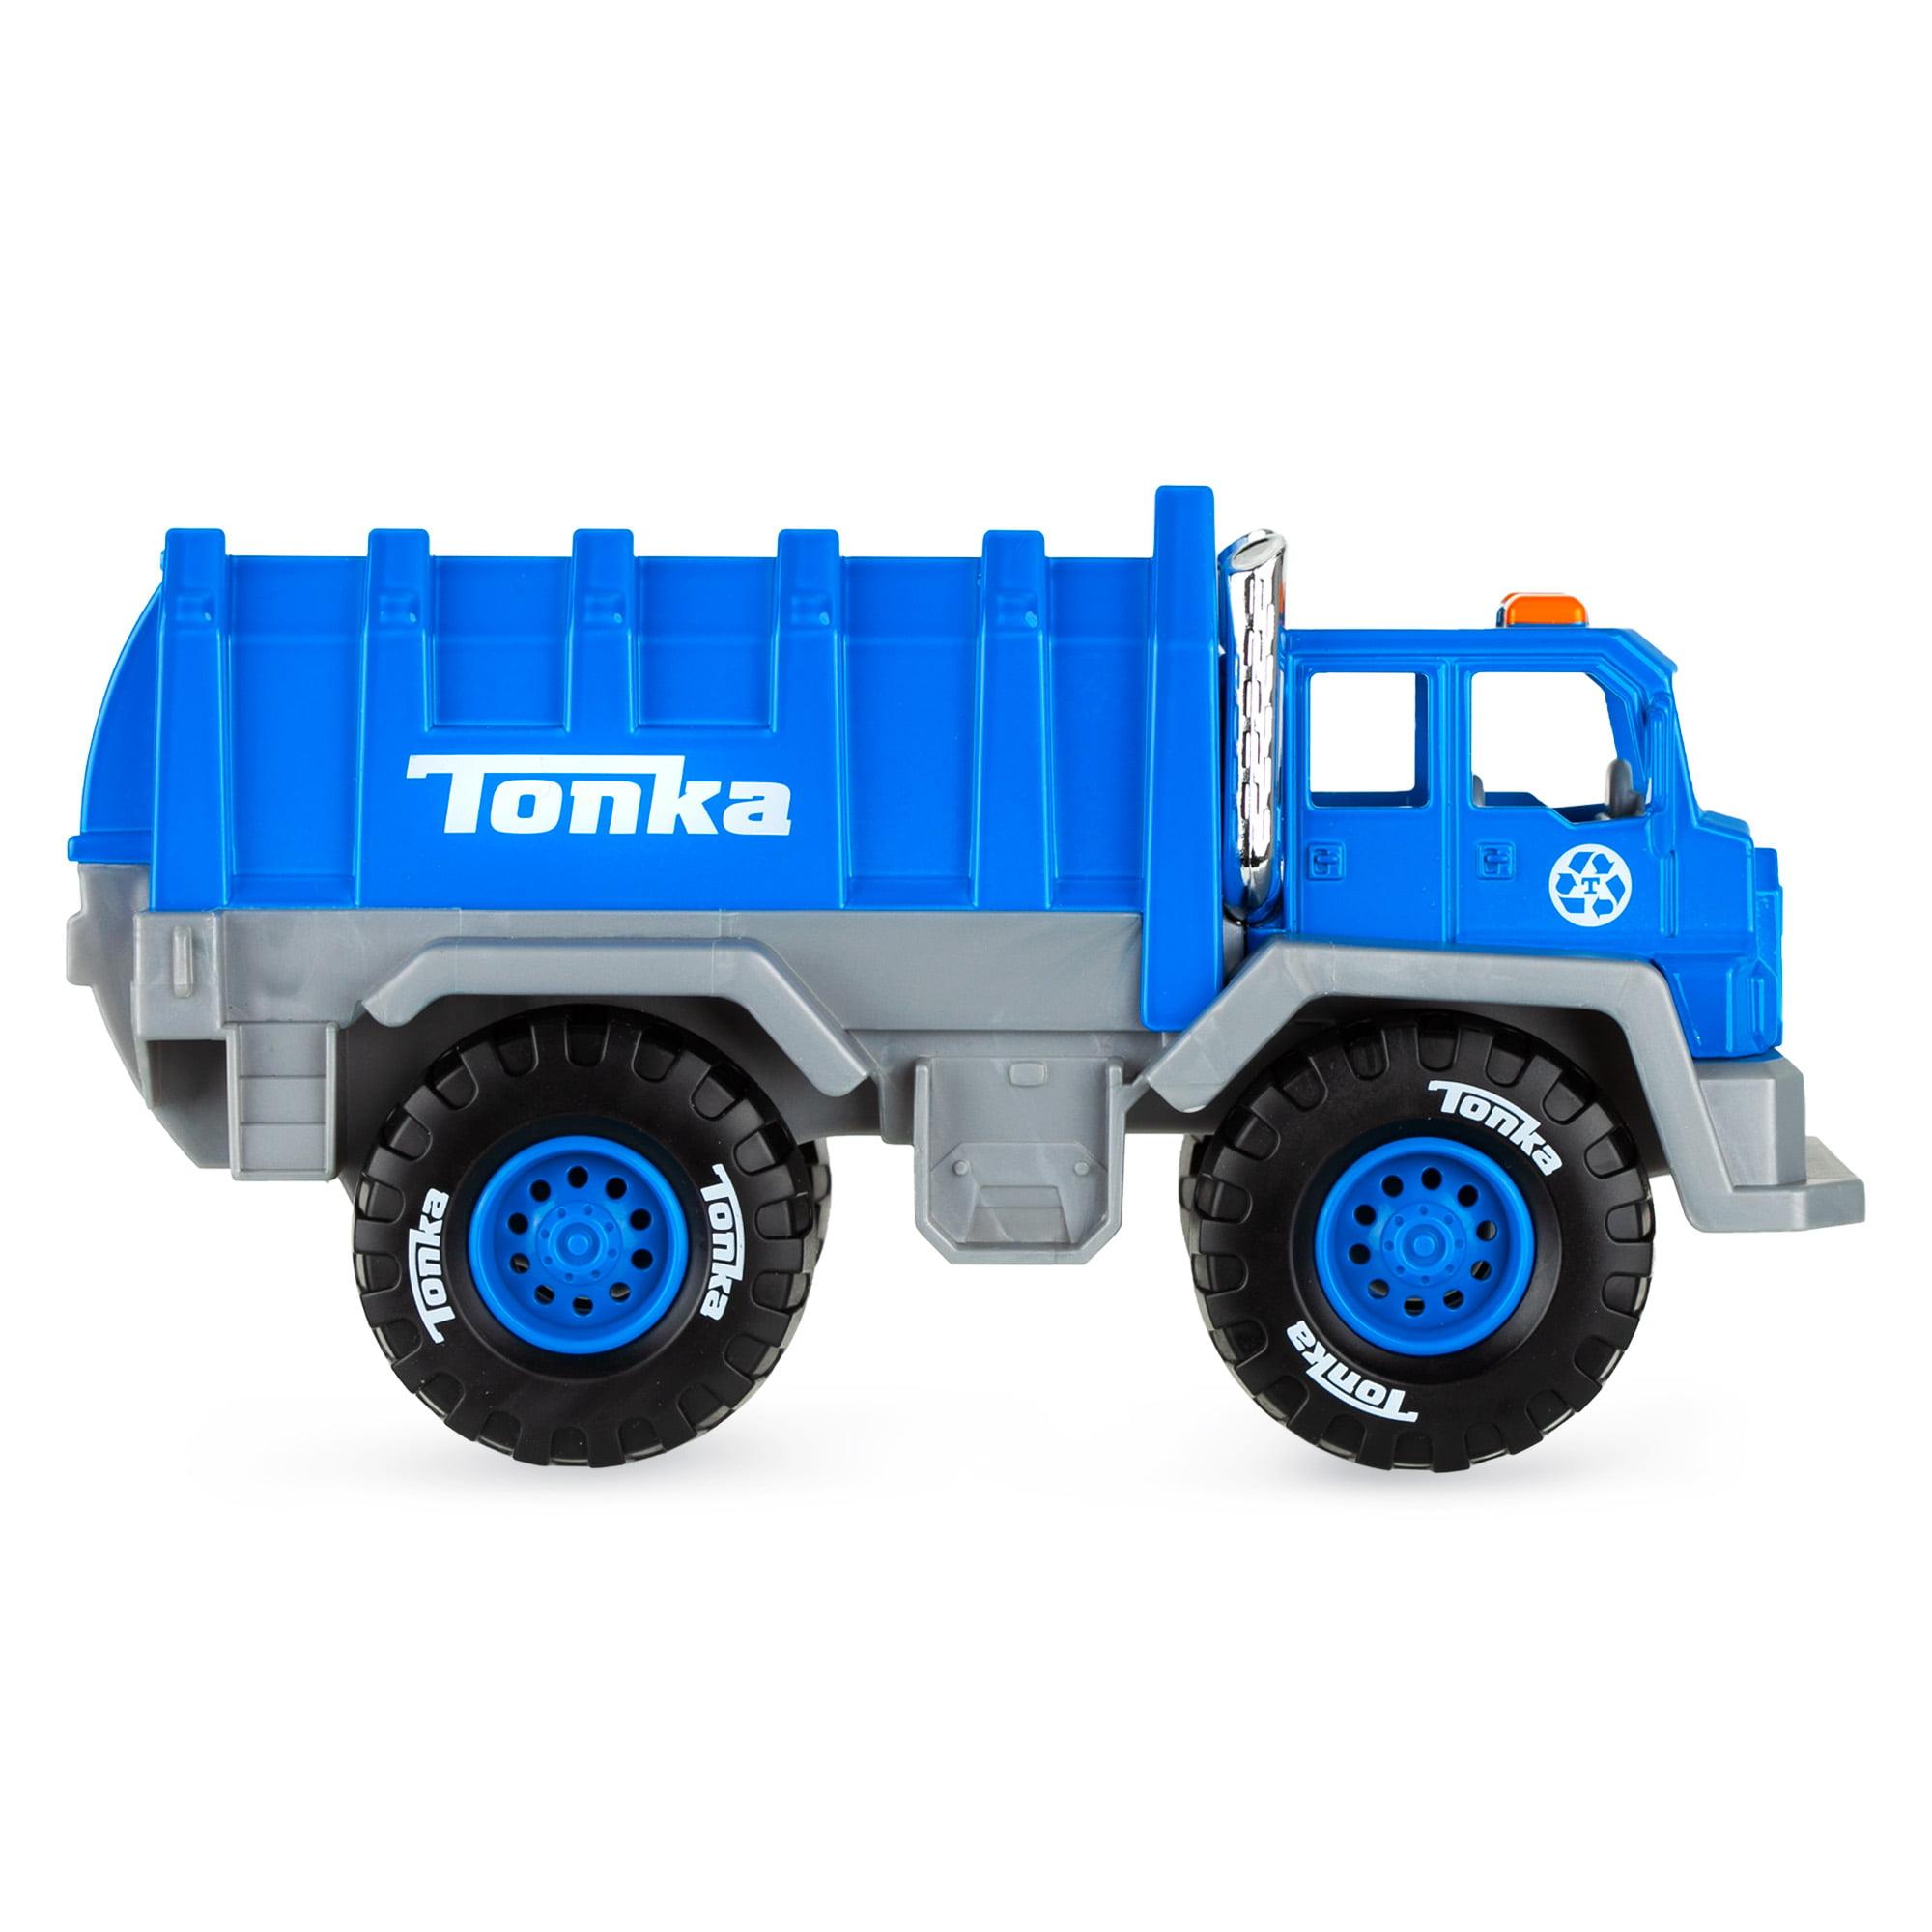 "Tonka - Mighty Metal Fleet - Garbage Truck - 8"" Metal Vehicle"